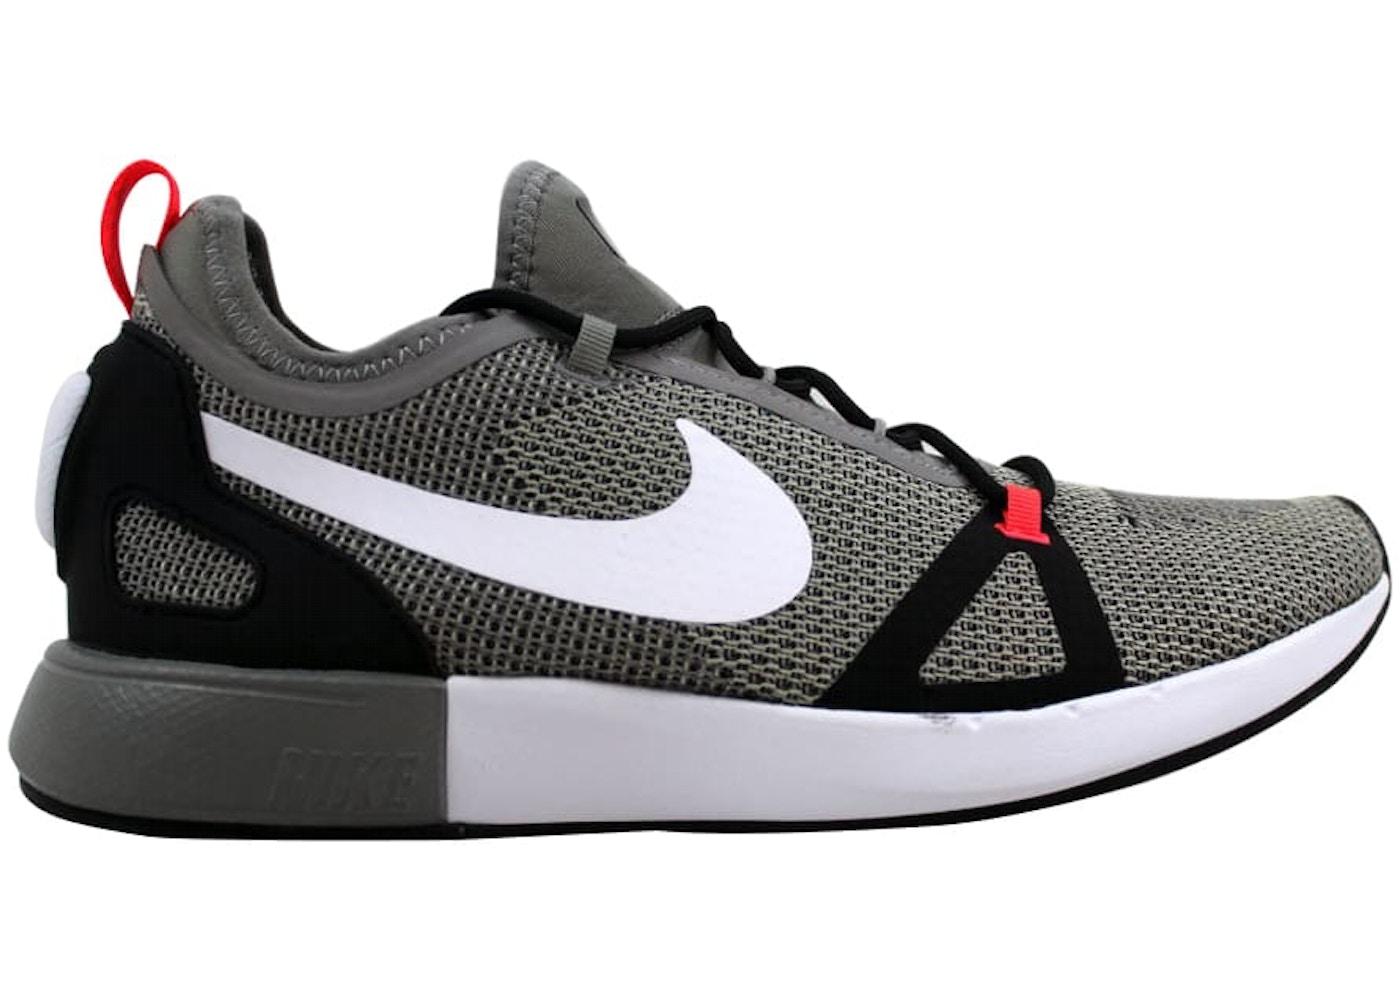 quality design b304c 099da Nike Duel Racer Light CharcoalWhite-Pale Grey - 918228-008